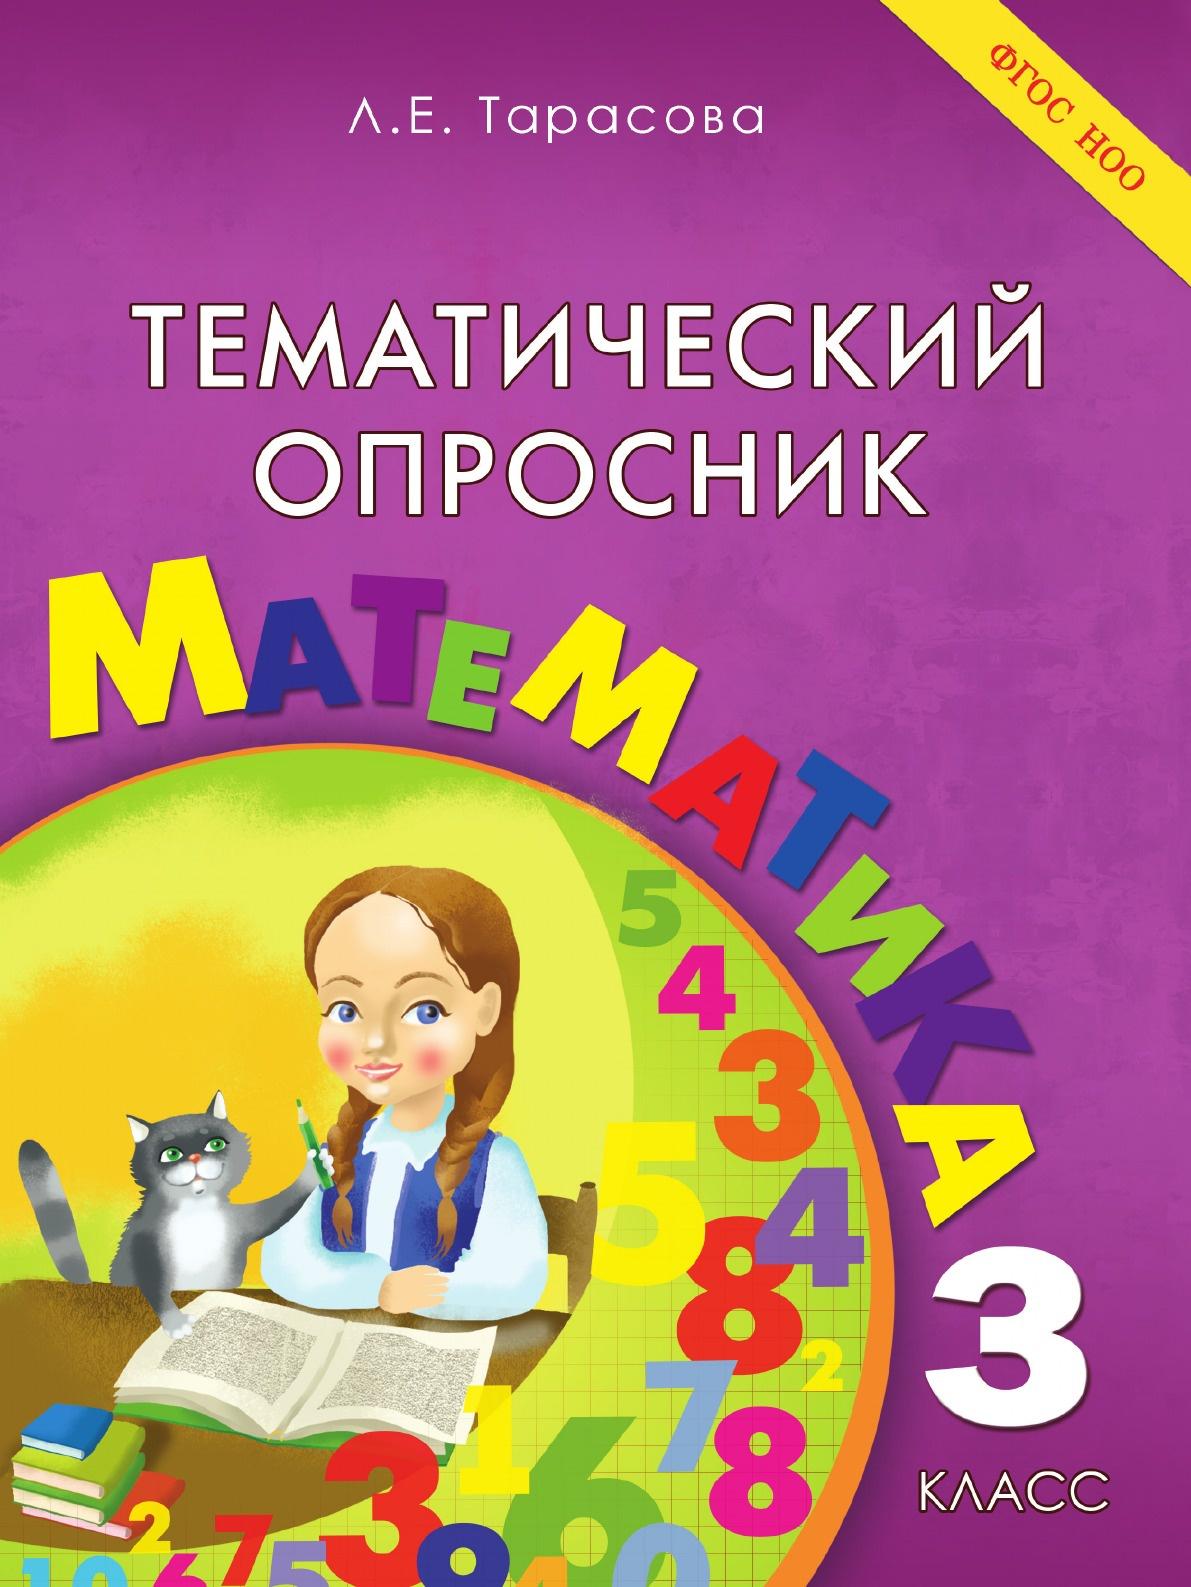 Тарасова Л.Е. Тематический опросник по математике. 3-й класс. ФГОС